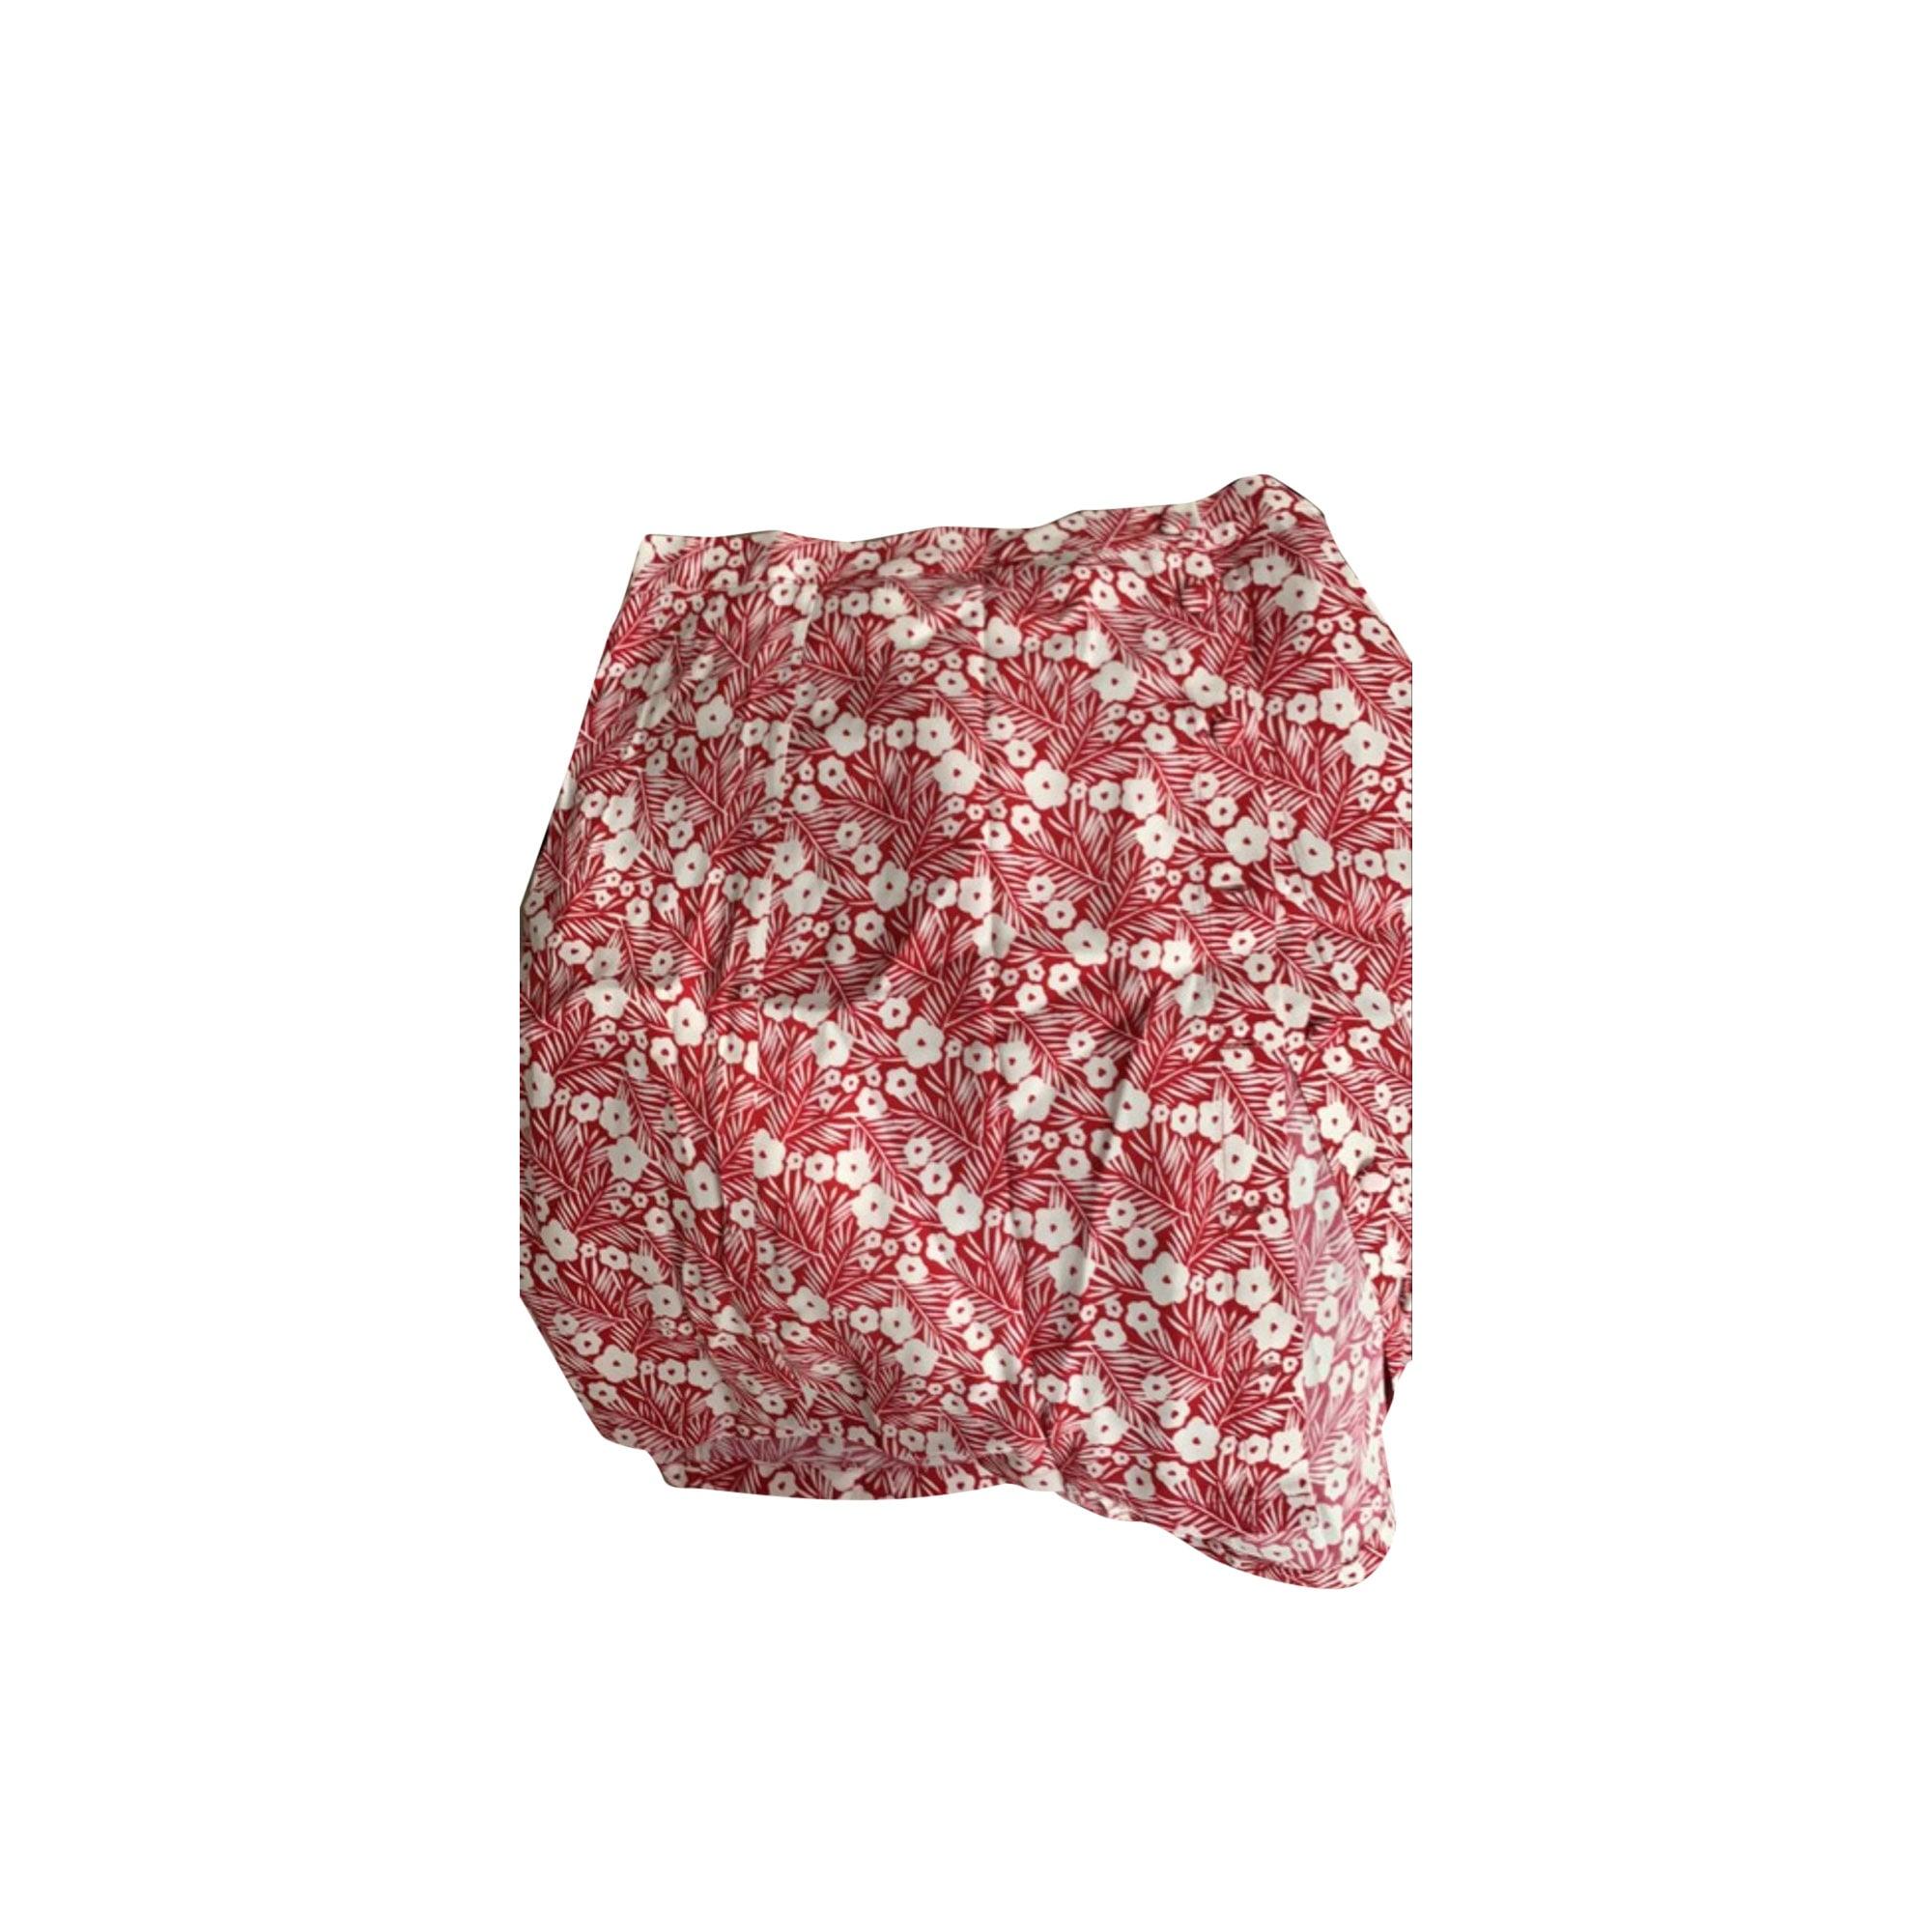 Midi Skirt DES PETITS HAUTS Red, burgundy